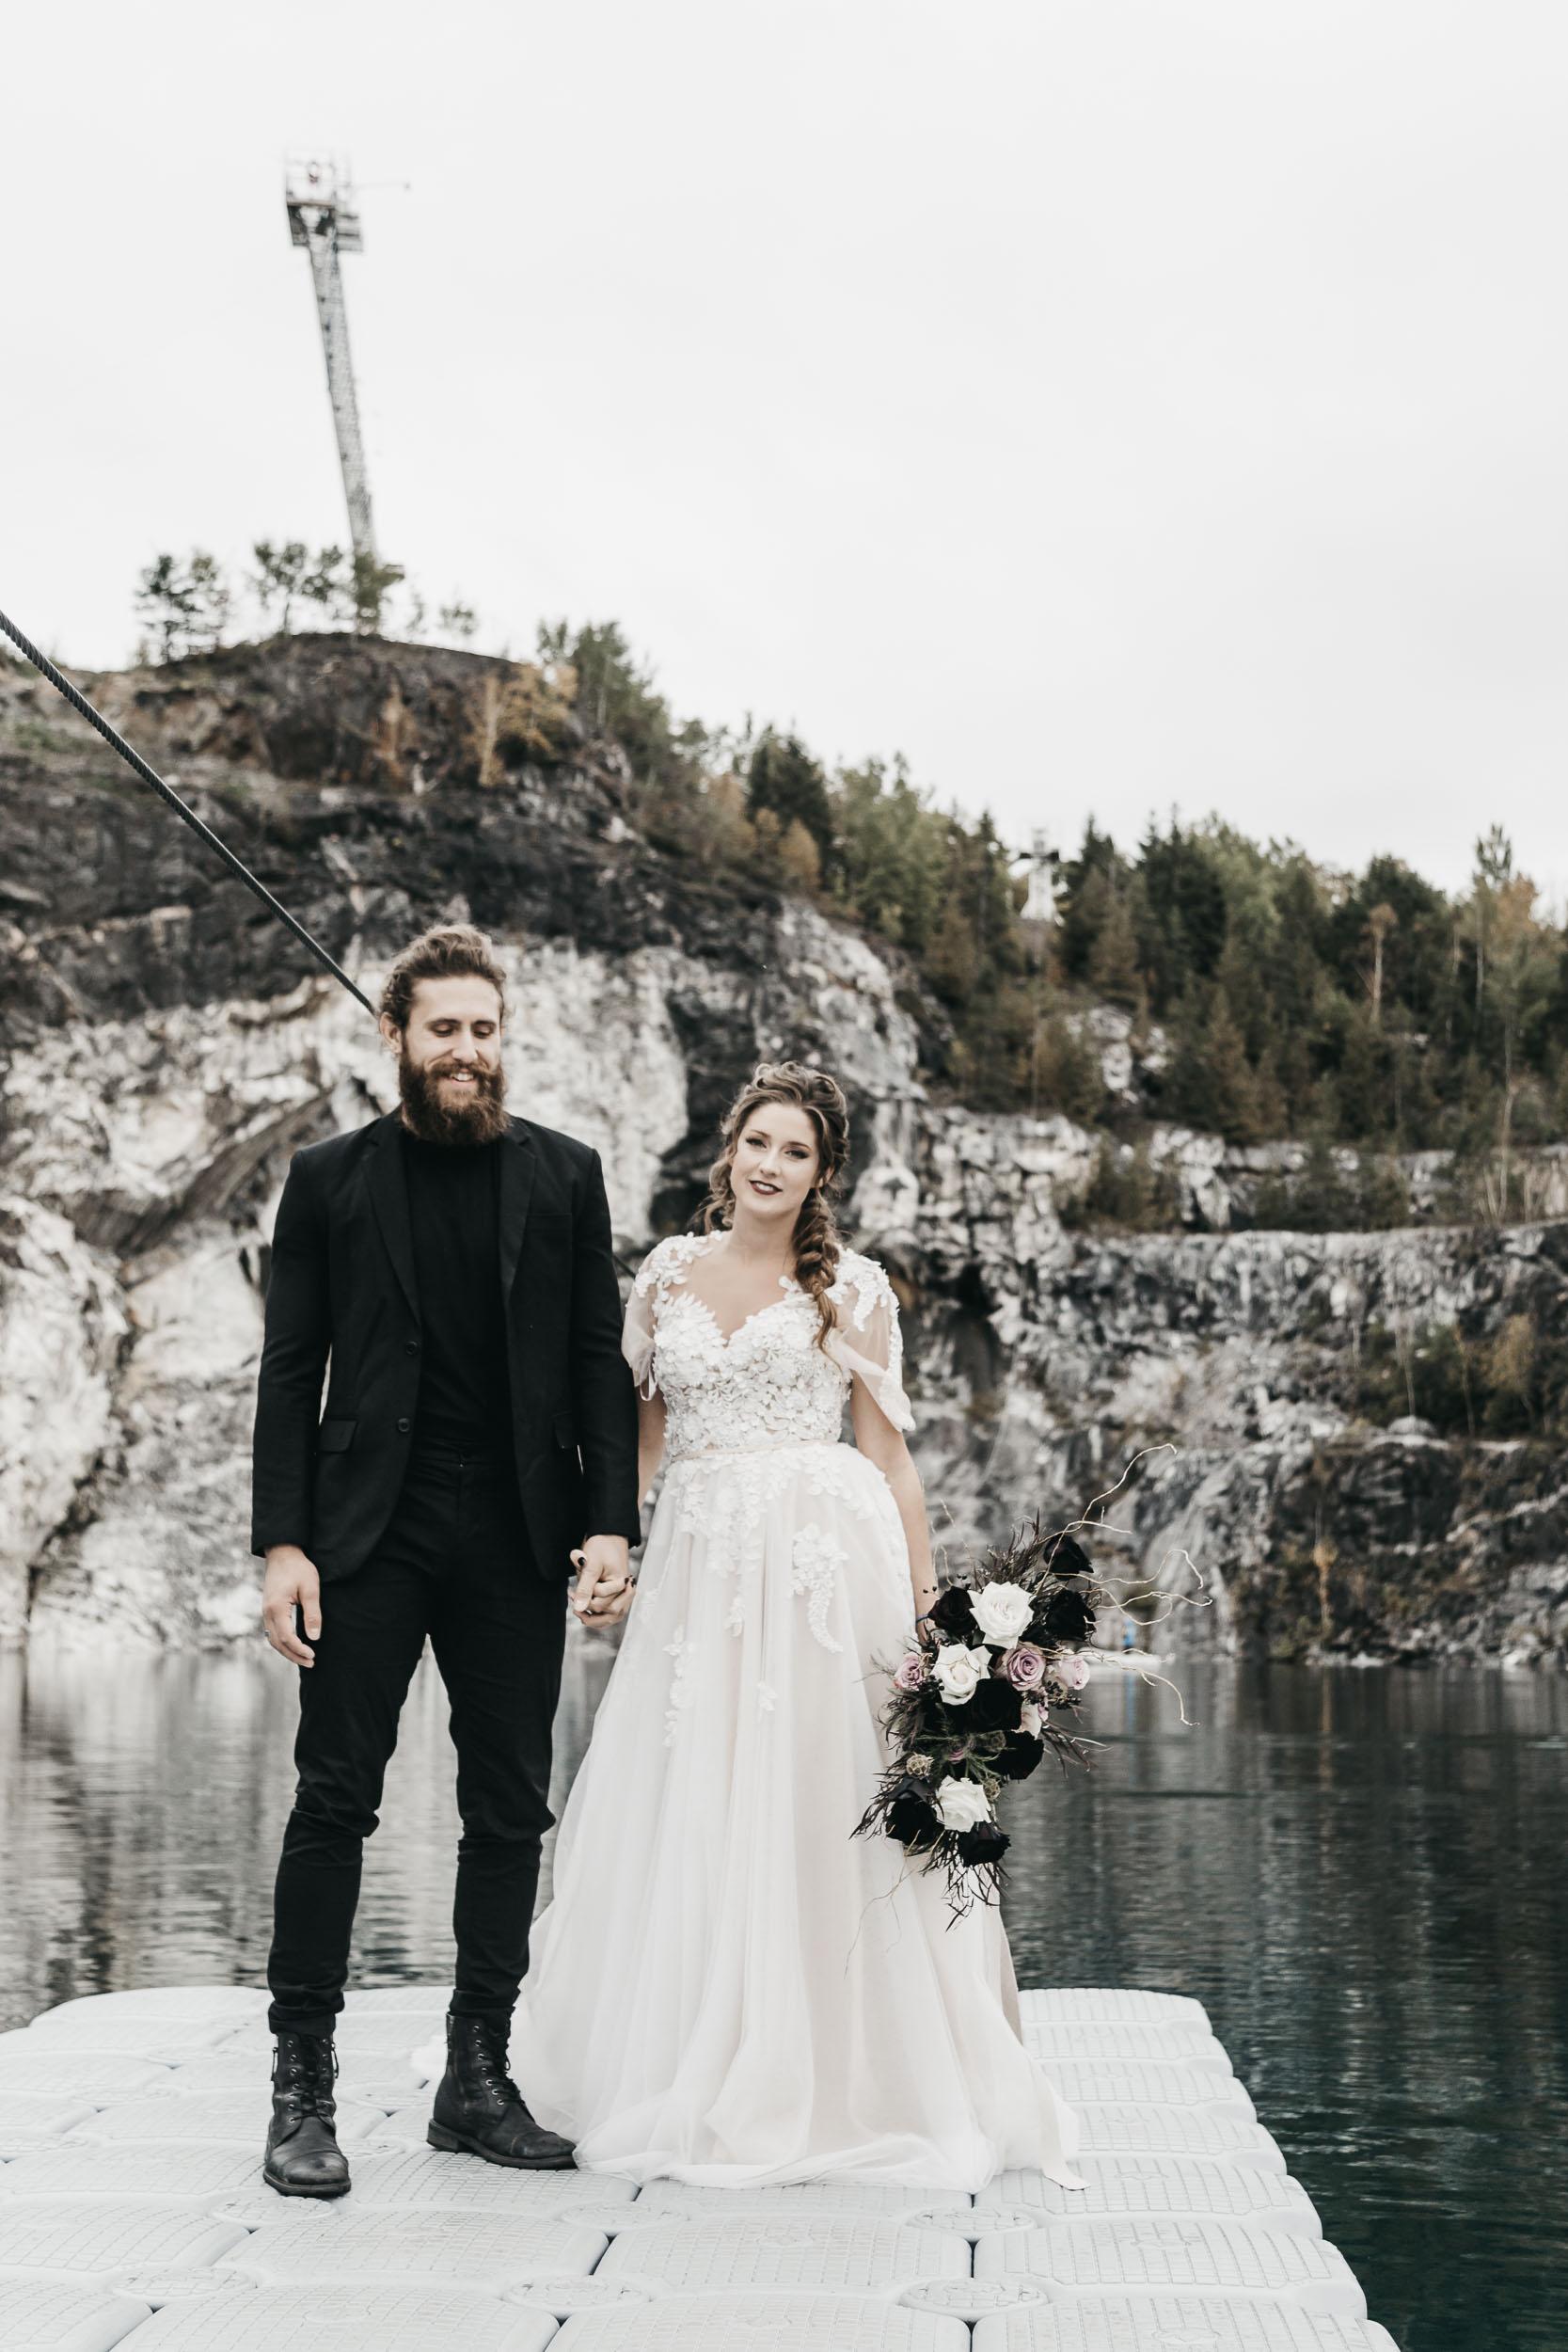 intimate-wedding-elopement-photographer-ottawa-toronto-9939.jpg